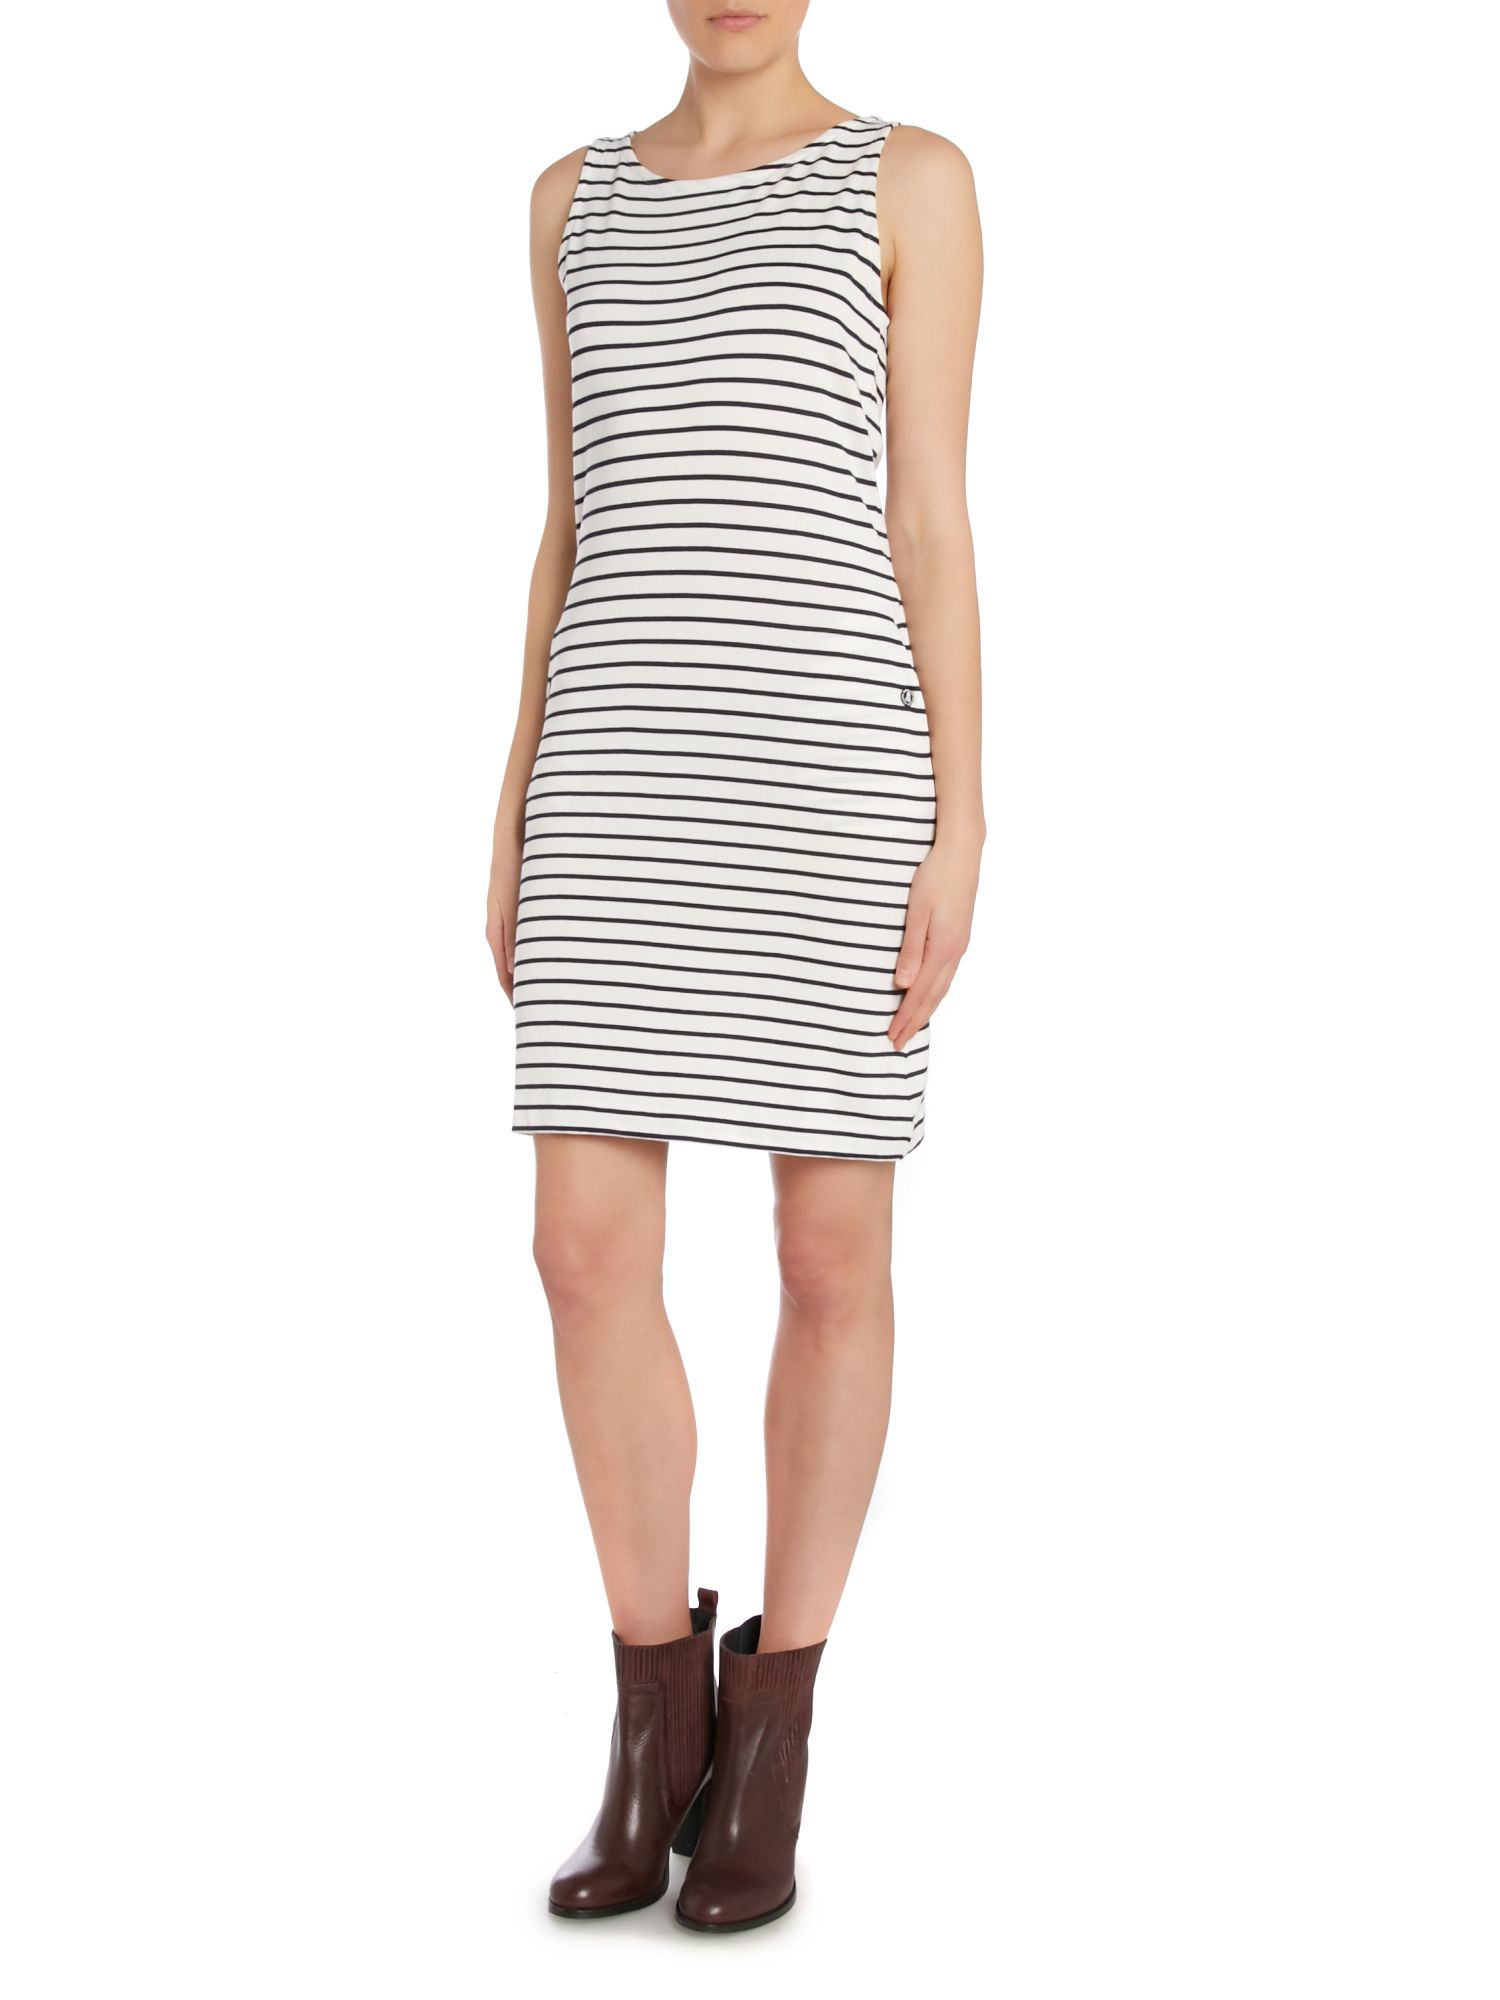 Barbour Dalmore Stripe Jersey Shift Dress in Multicolor   Lyst